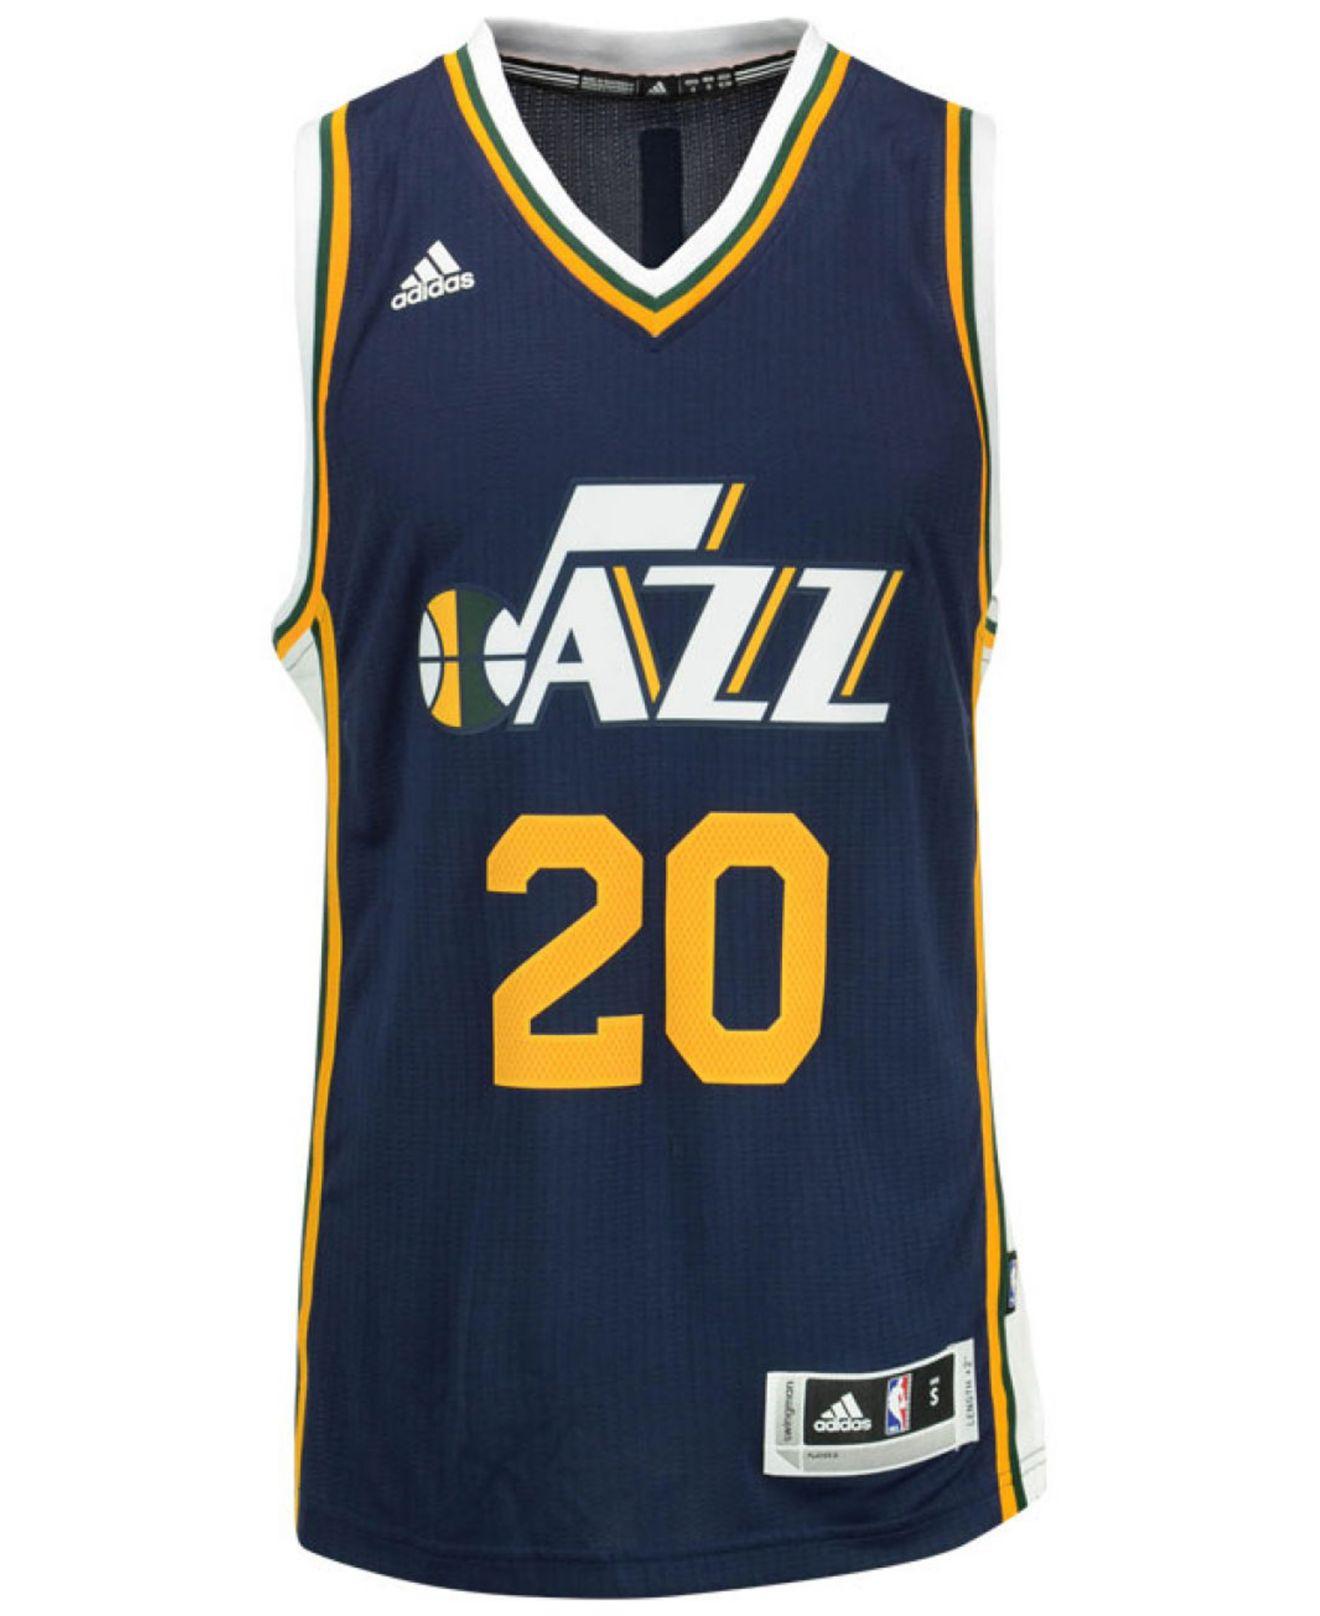 7db5d8a0b Lyst - Adidas Originals Men s Gordon Hayward Utah Jazz Swingman ...